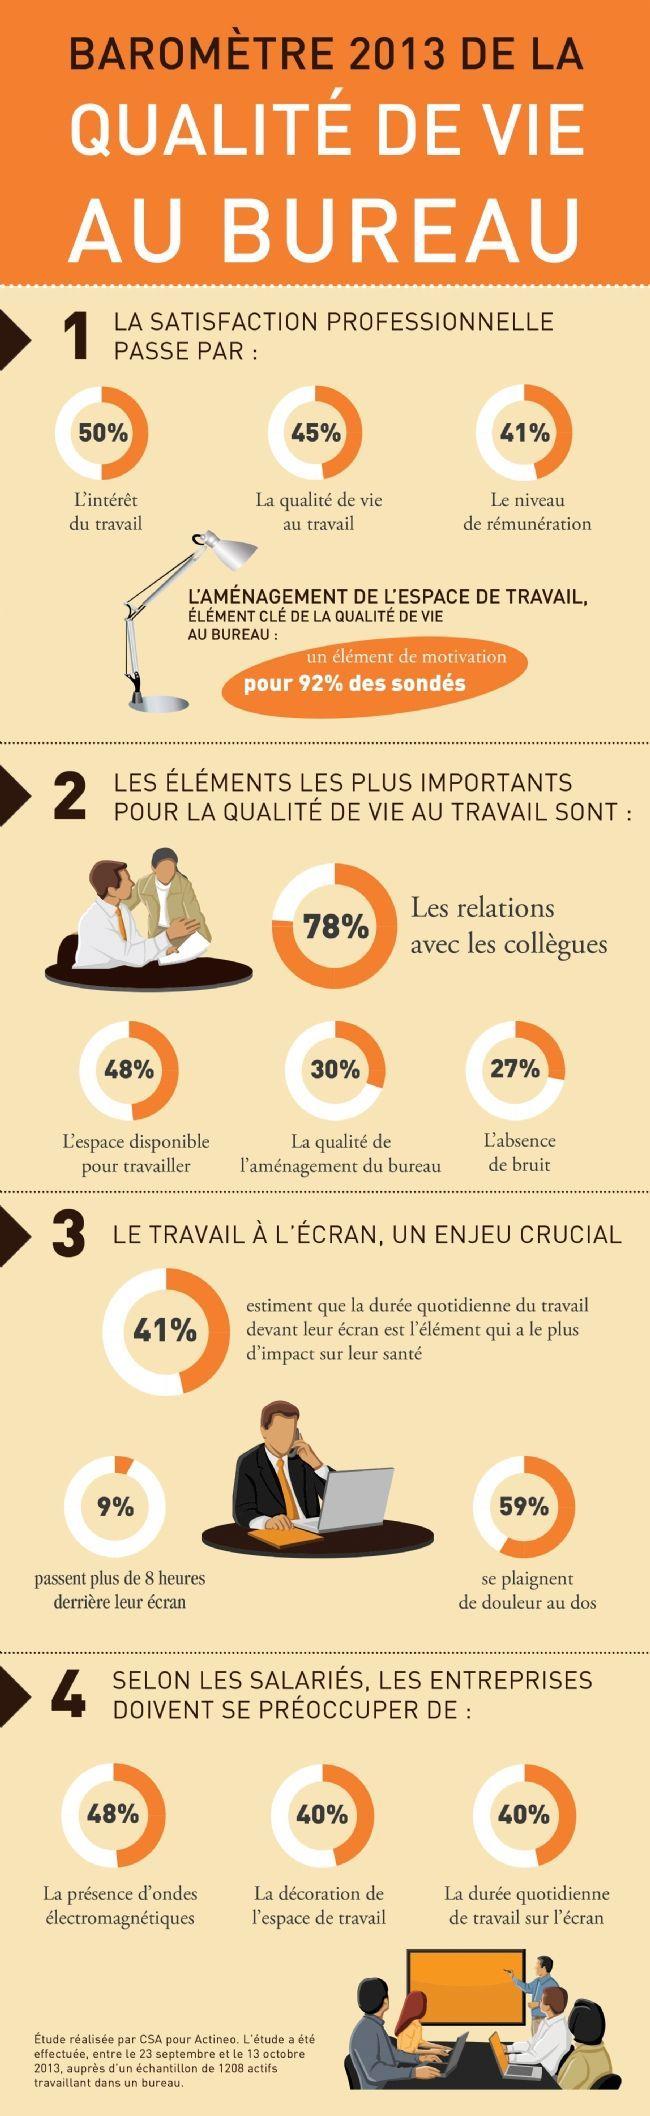 Psychology-Infographic-infographie-qualite-vie-bureau-2013-actineo Psychology Infographic : infographie-qualite-vie-bureau-2013-actineo